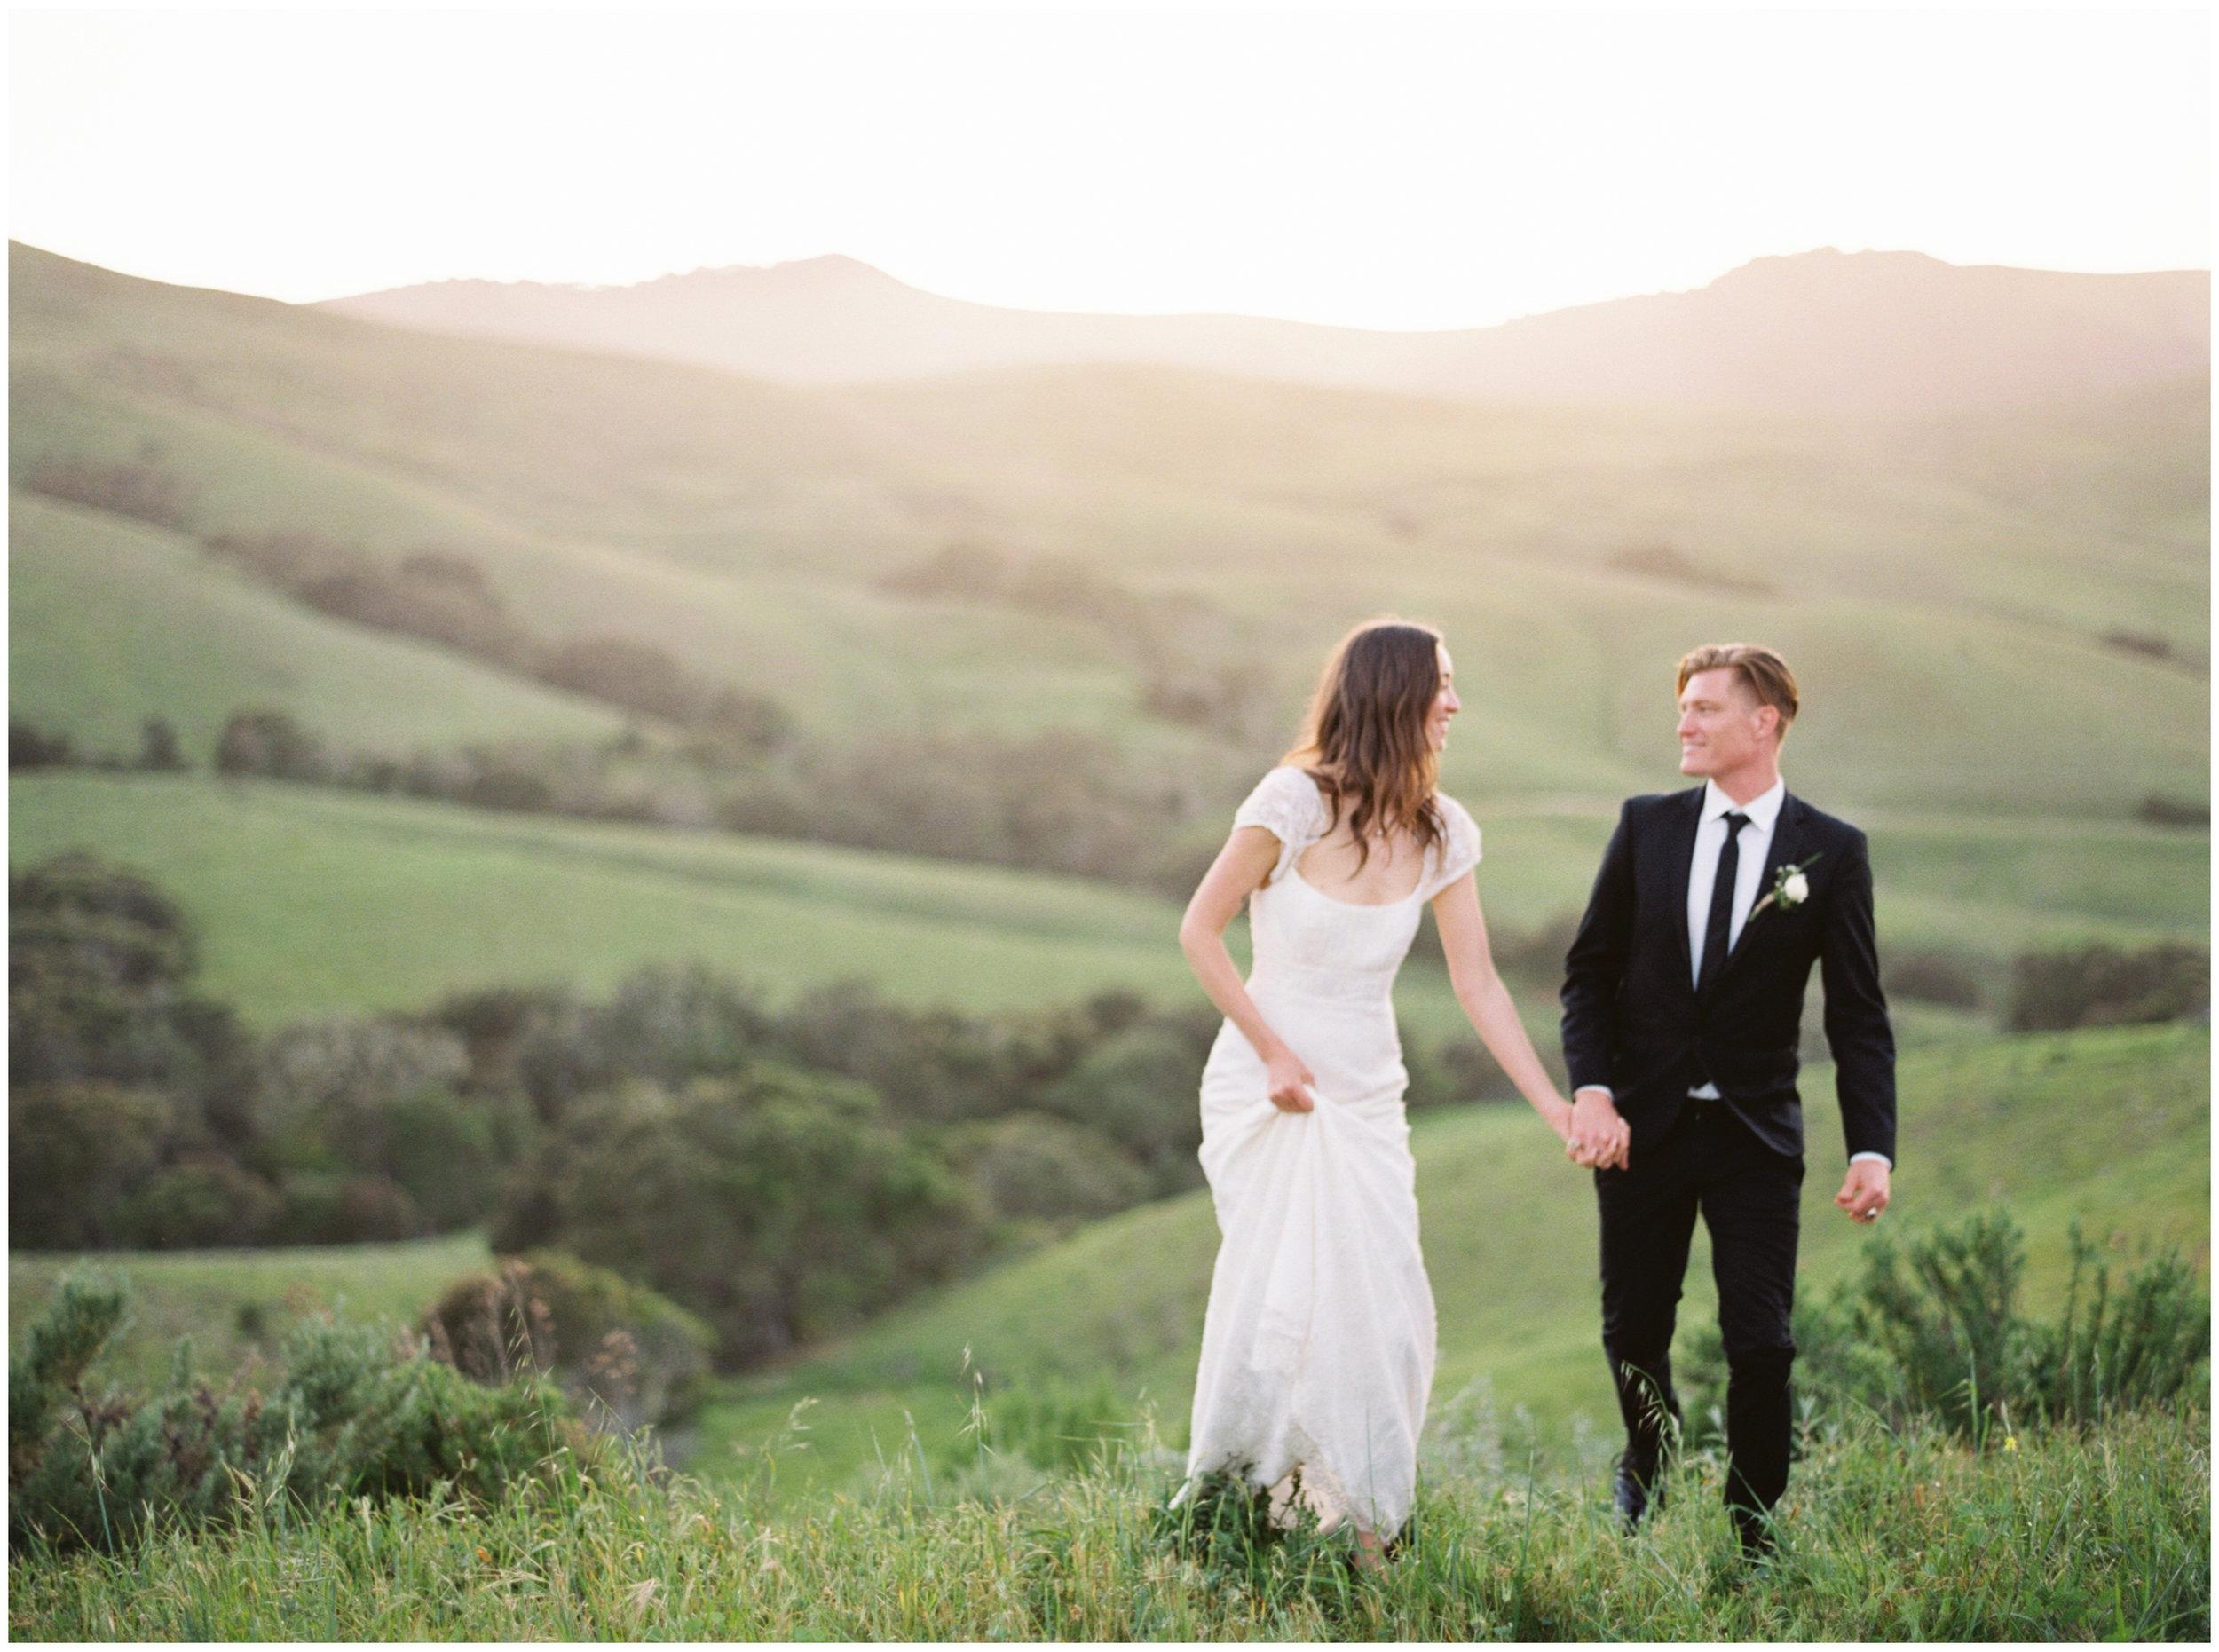 Los_Angeles_Wedding_Photographer_Pinnel_Photography_La_Purisima-4.jpg